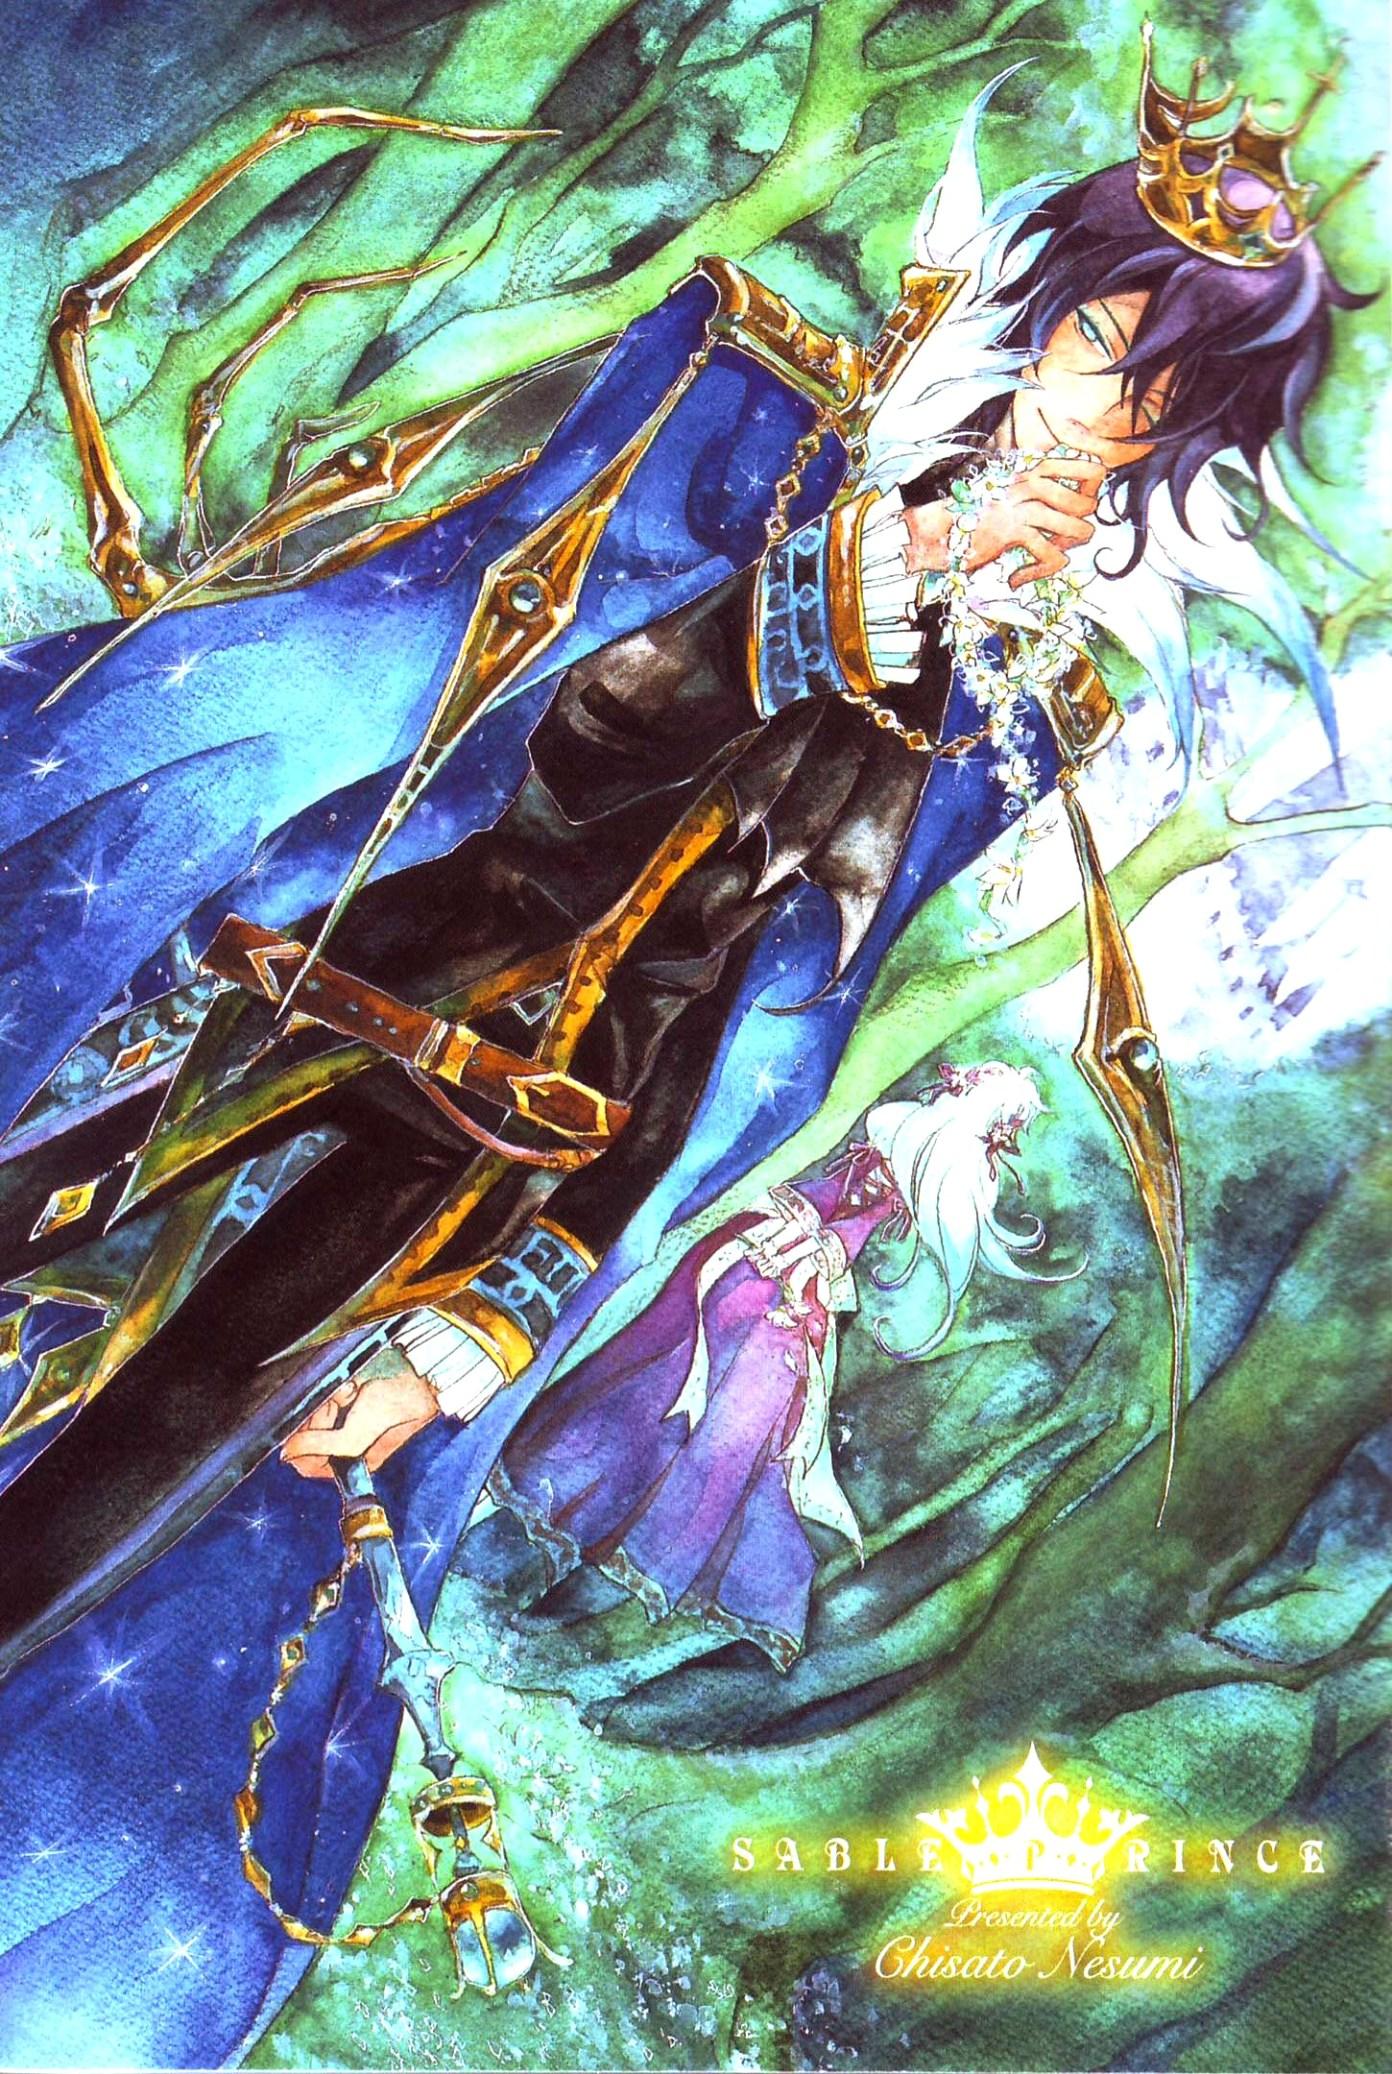 Sable Prince - Nesumi Chisato - Zerochan Anime Image Board